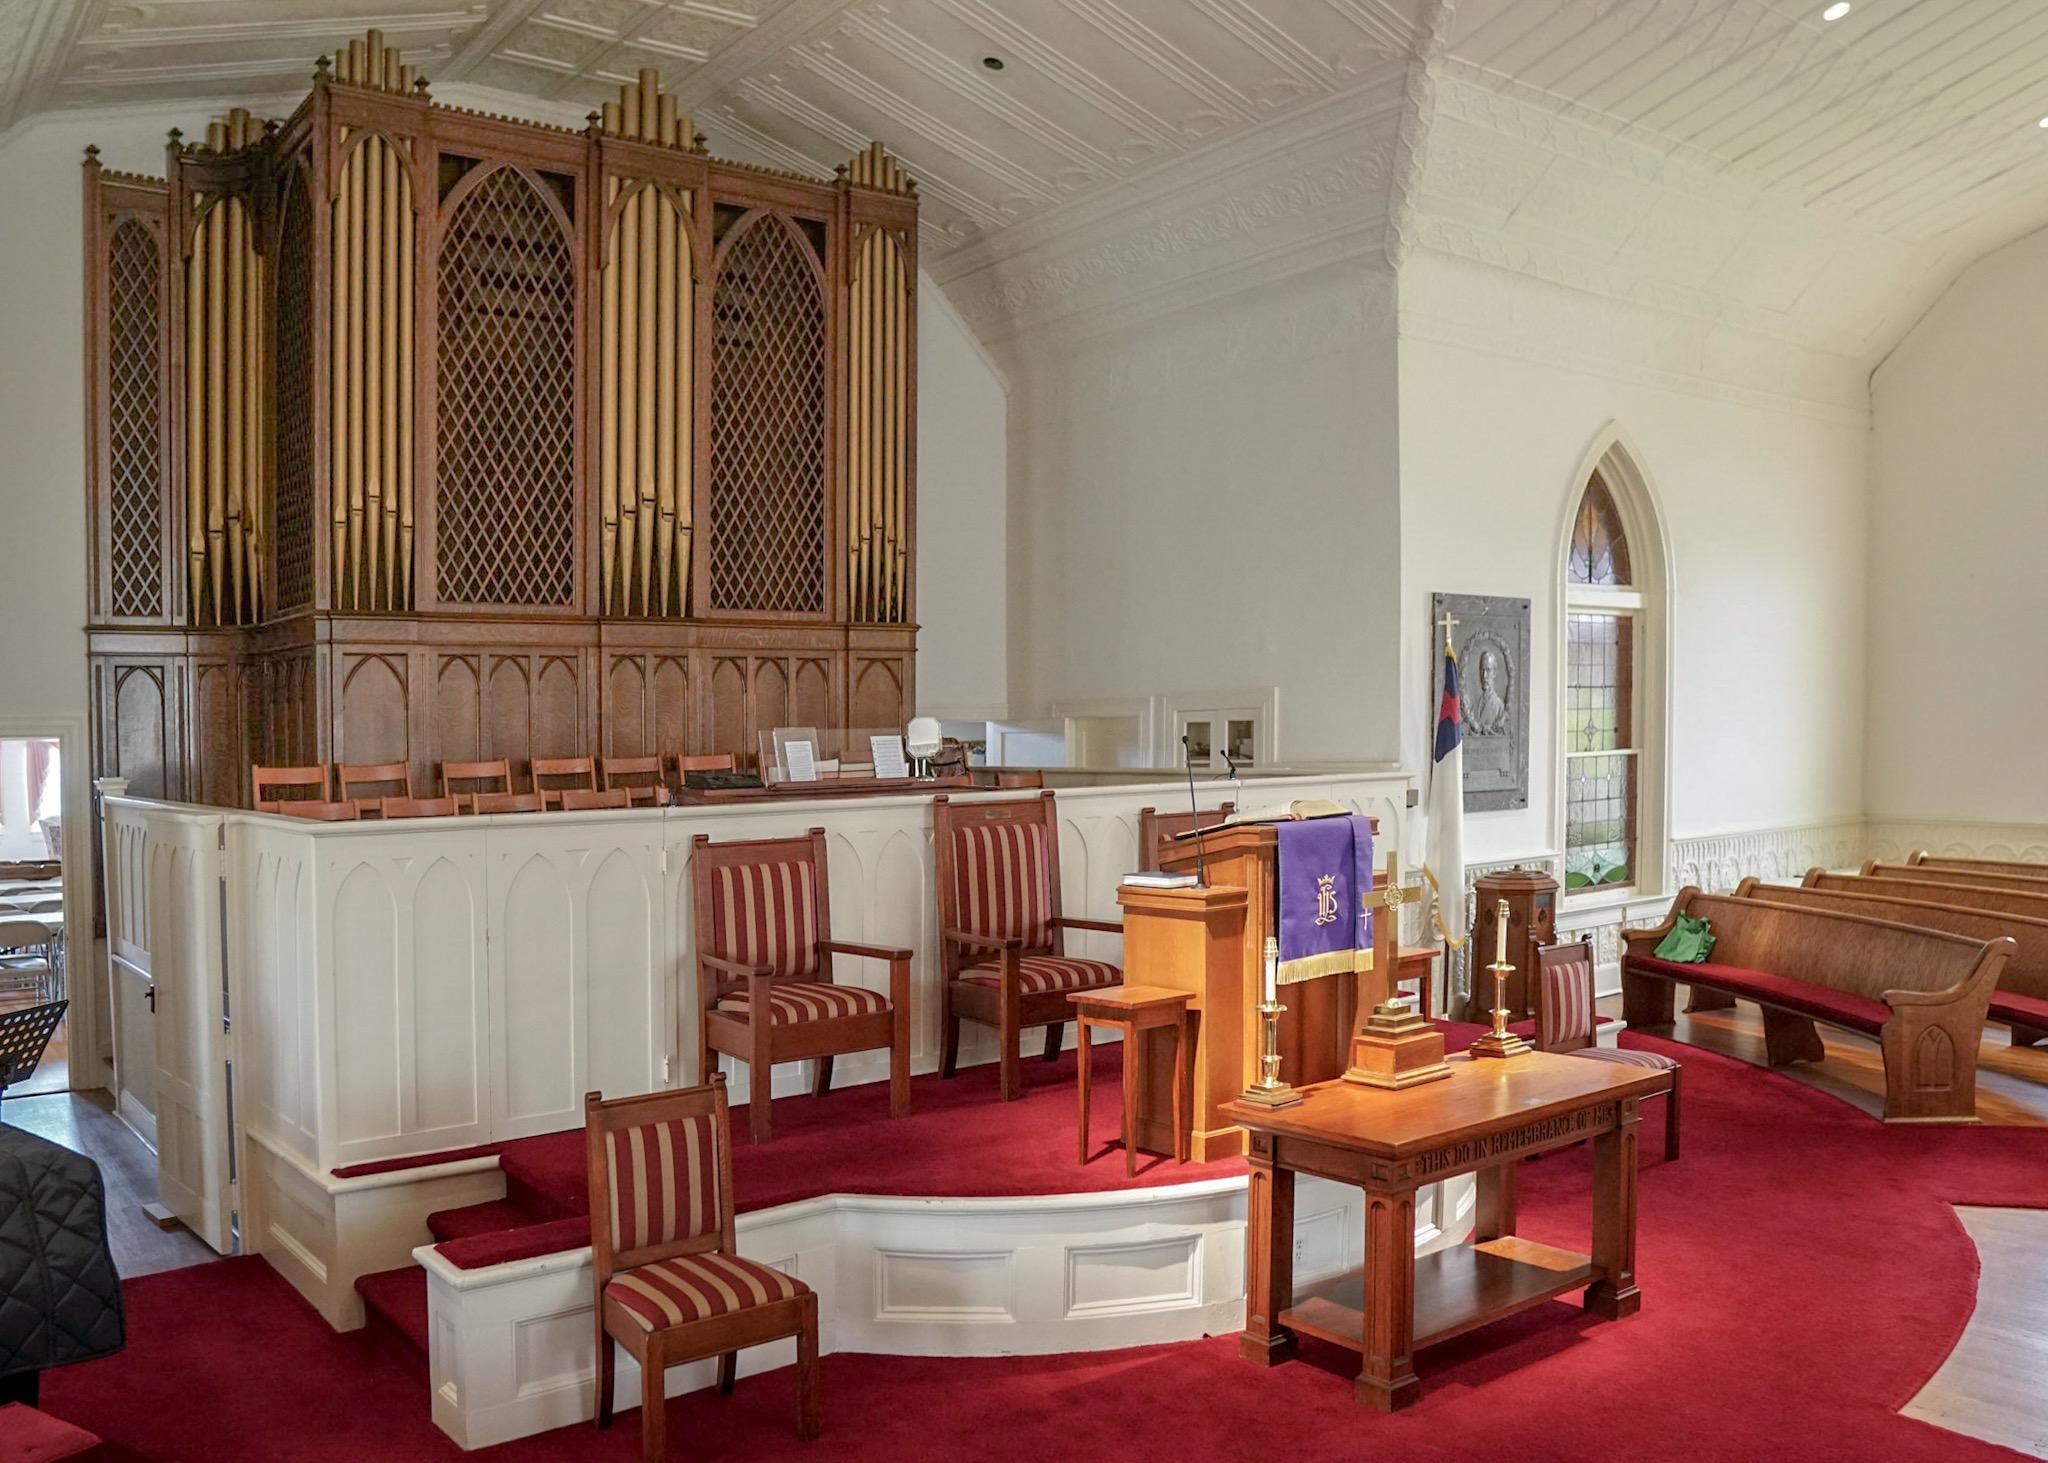 Blackstone sanctuary